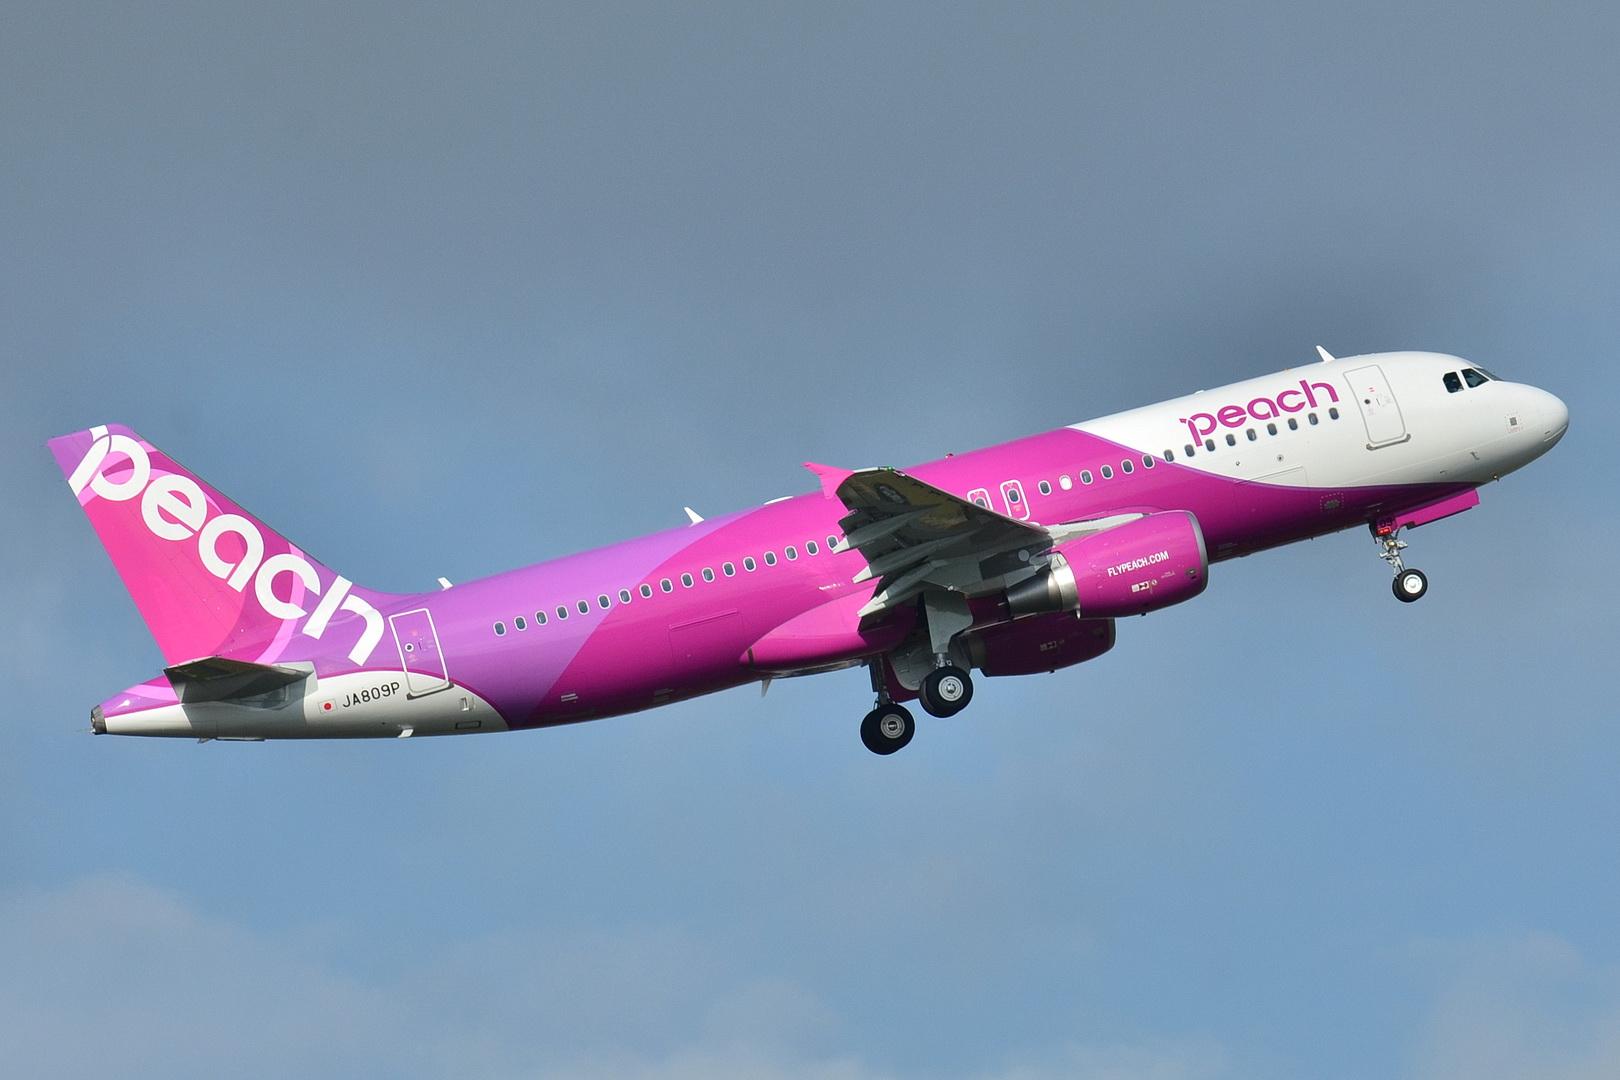 https://upload.wikimedia.org/wikipedia/commons/8/80/Airbus_A320-200_Peach_(APJ)_JA809P_-_MSN_5640_(9322789412).jpg